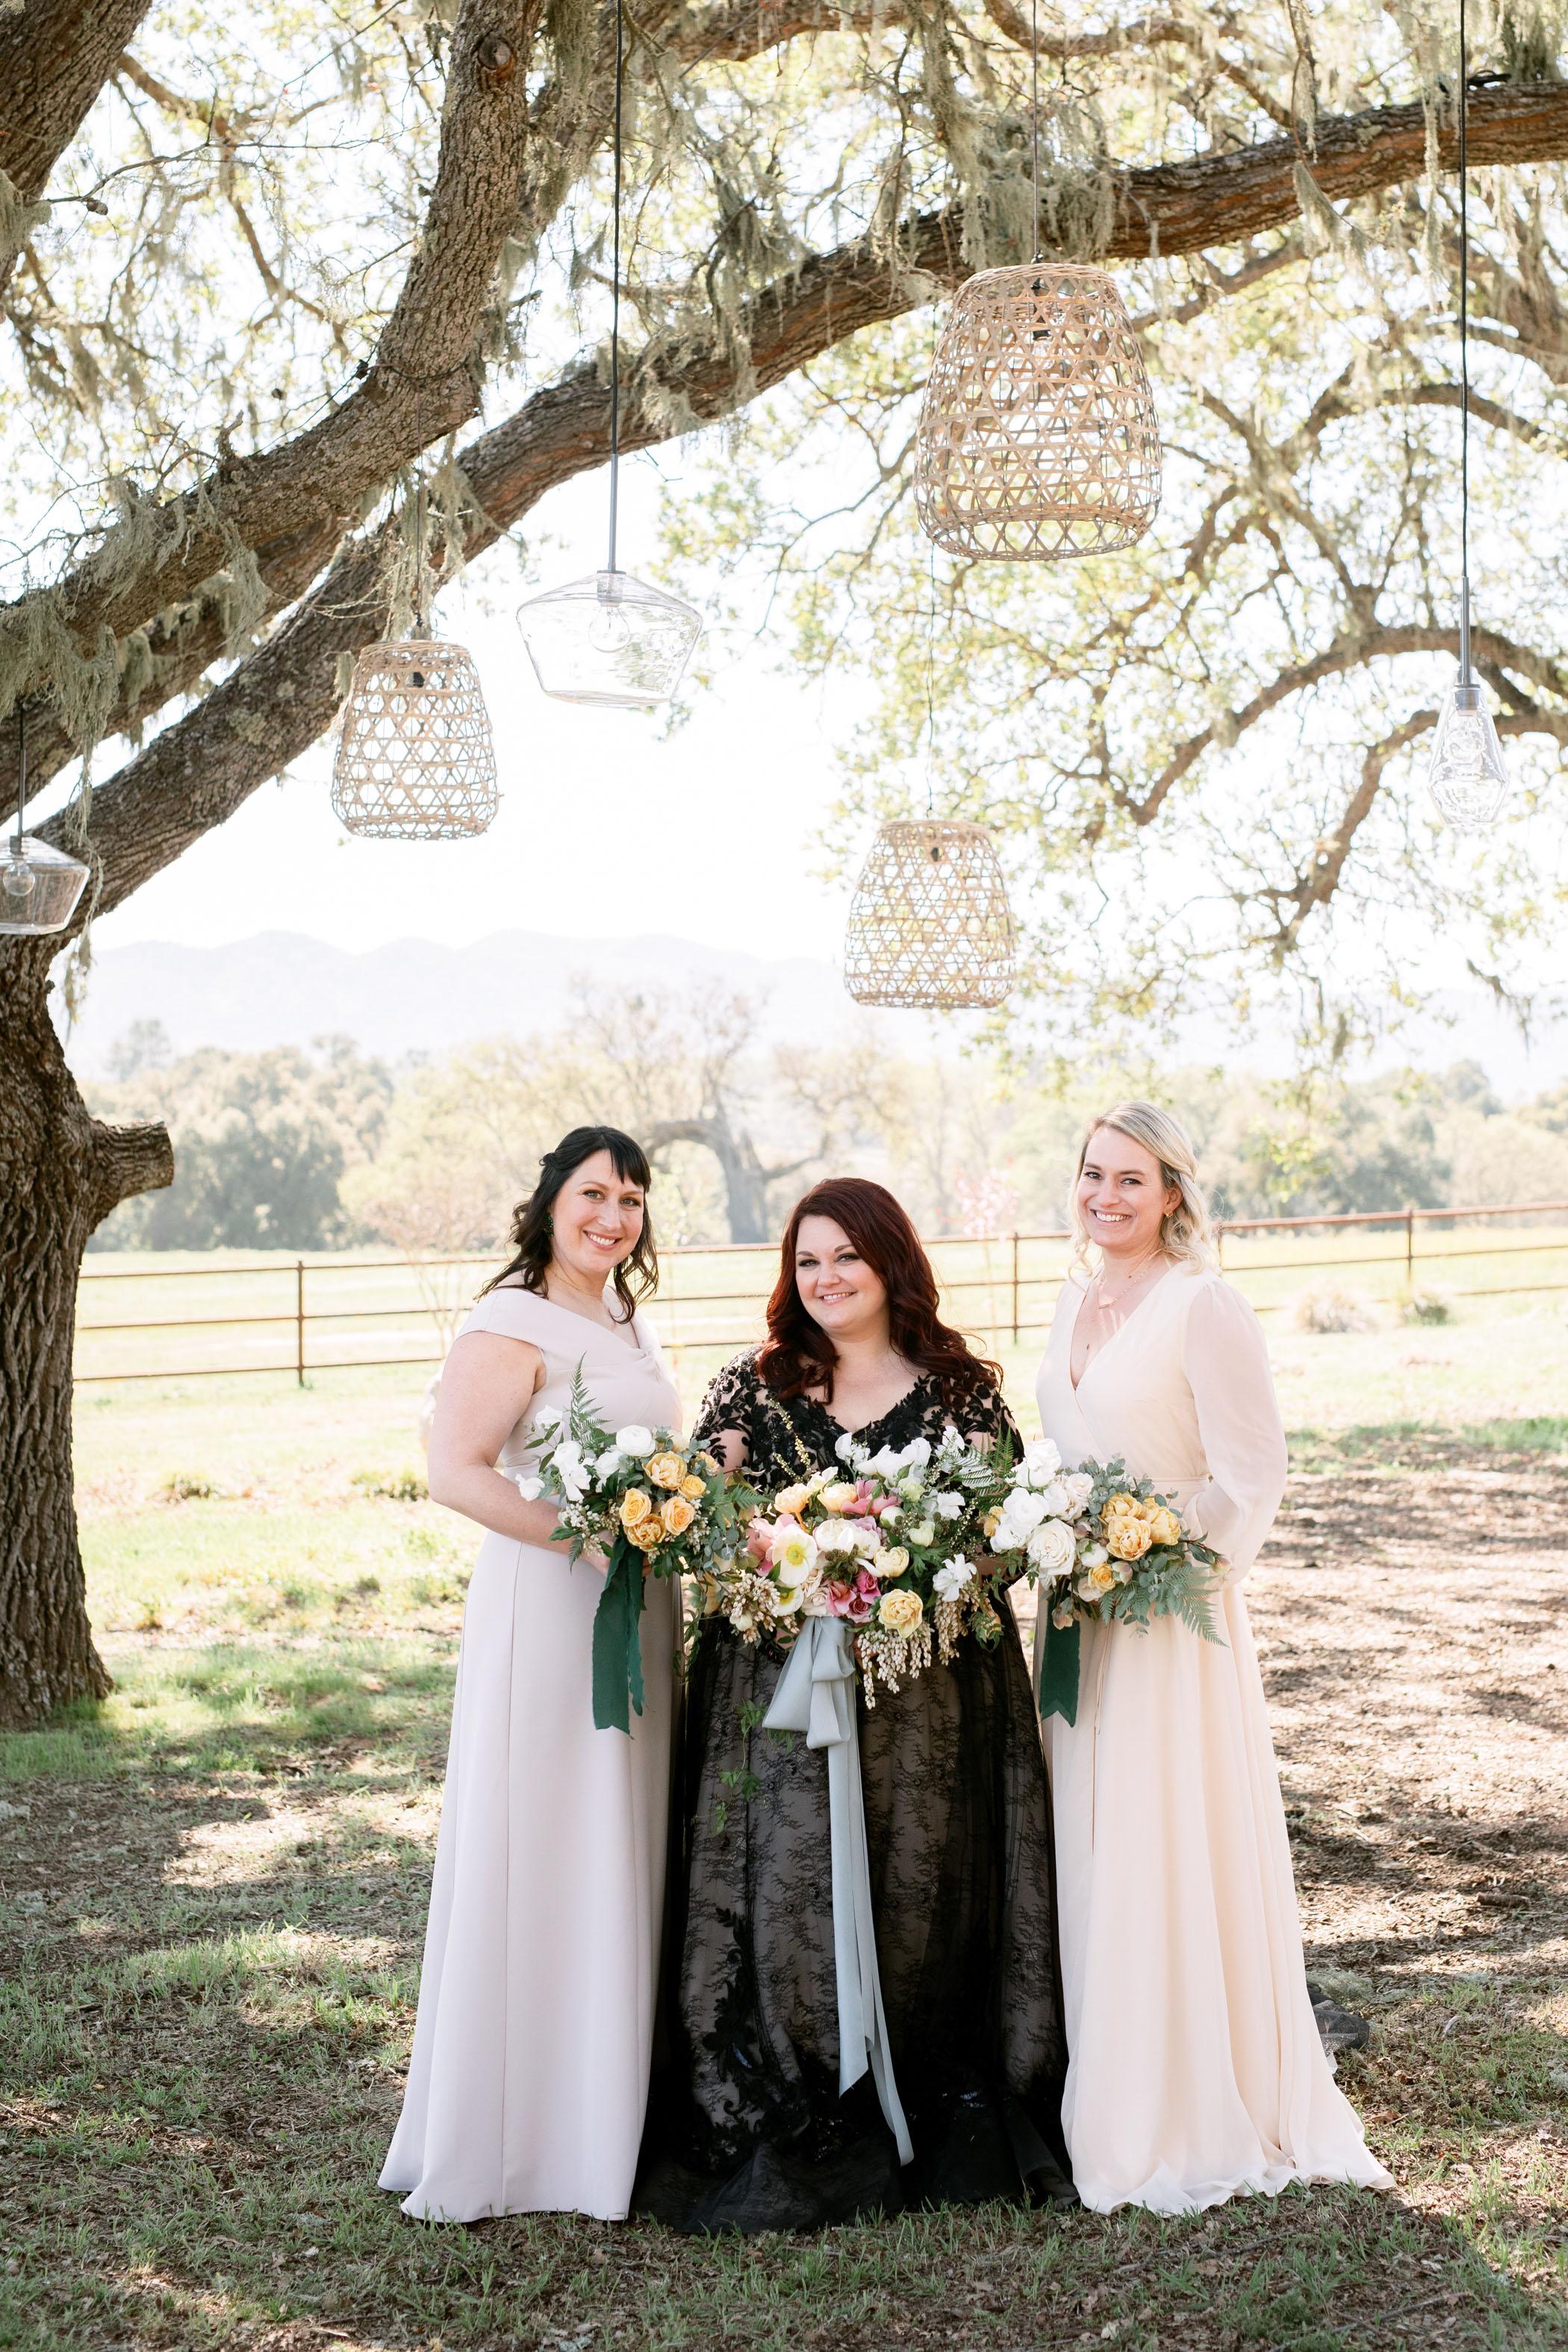 Black Wedding Dress White Bridesmaid Dresses